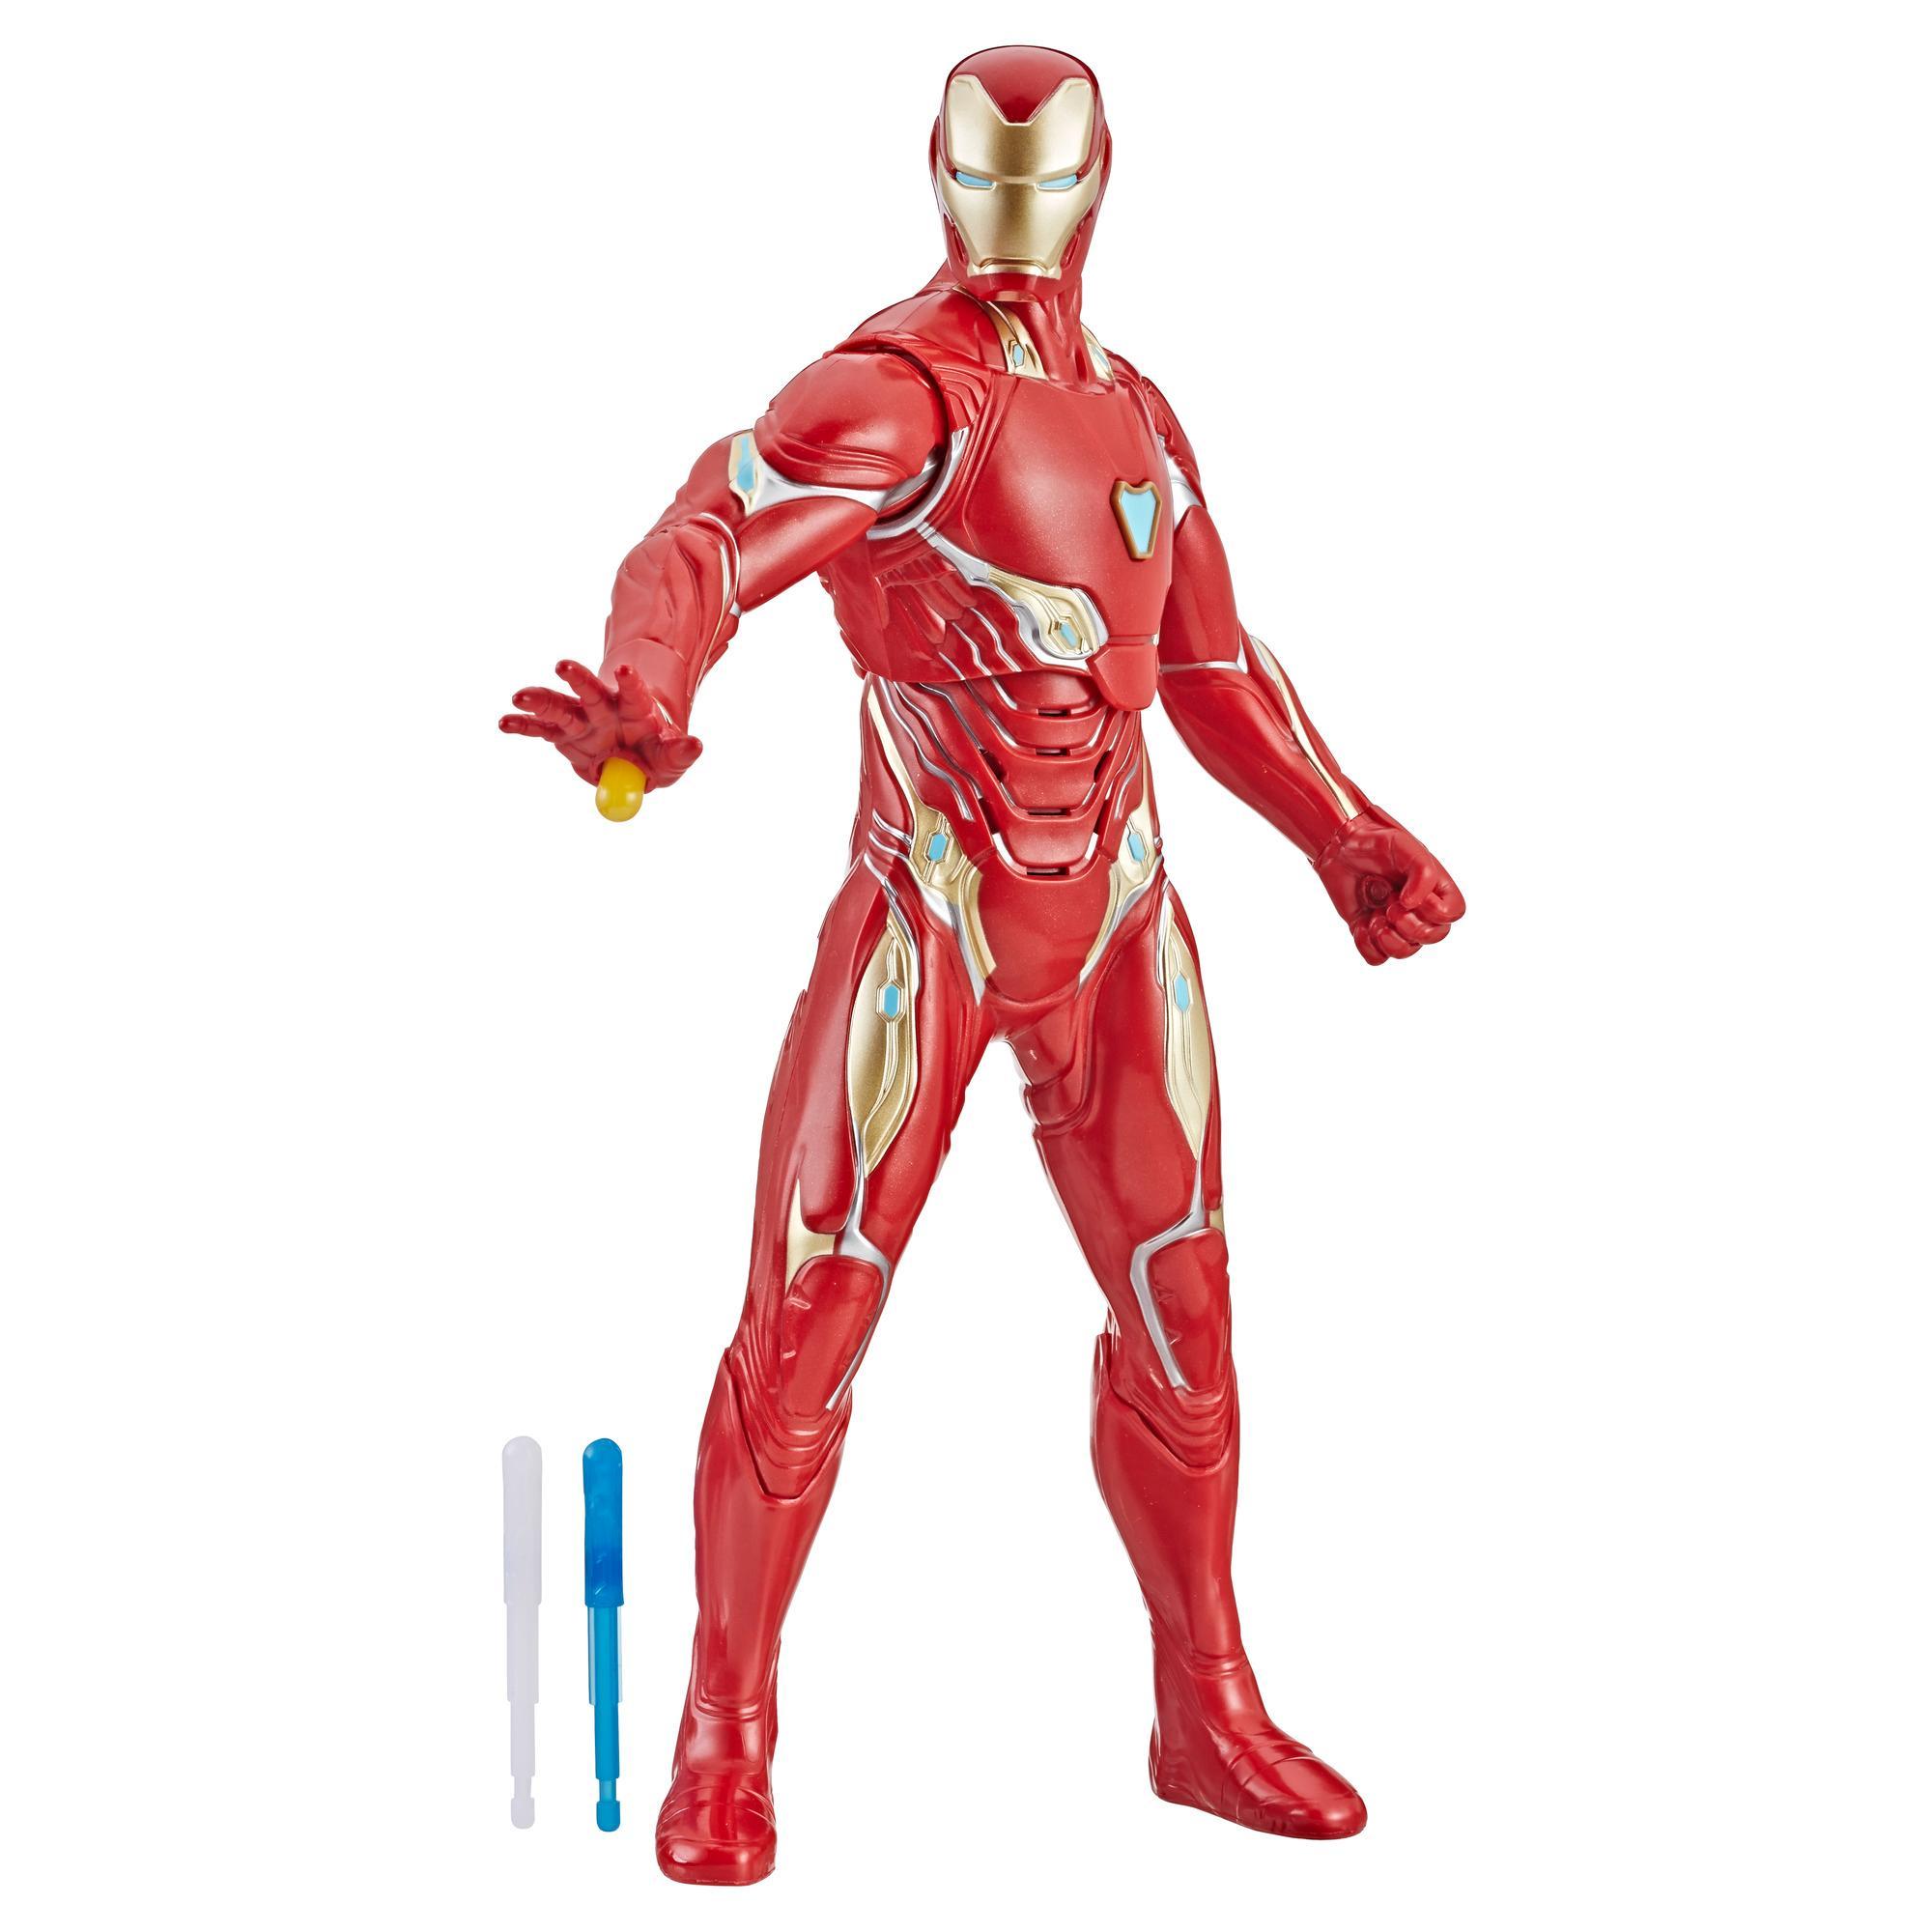 Avengers Feature Figur IRON MAN